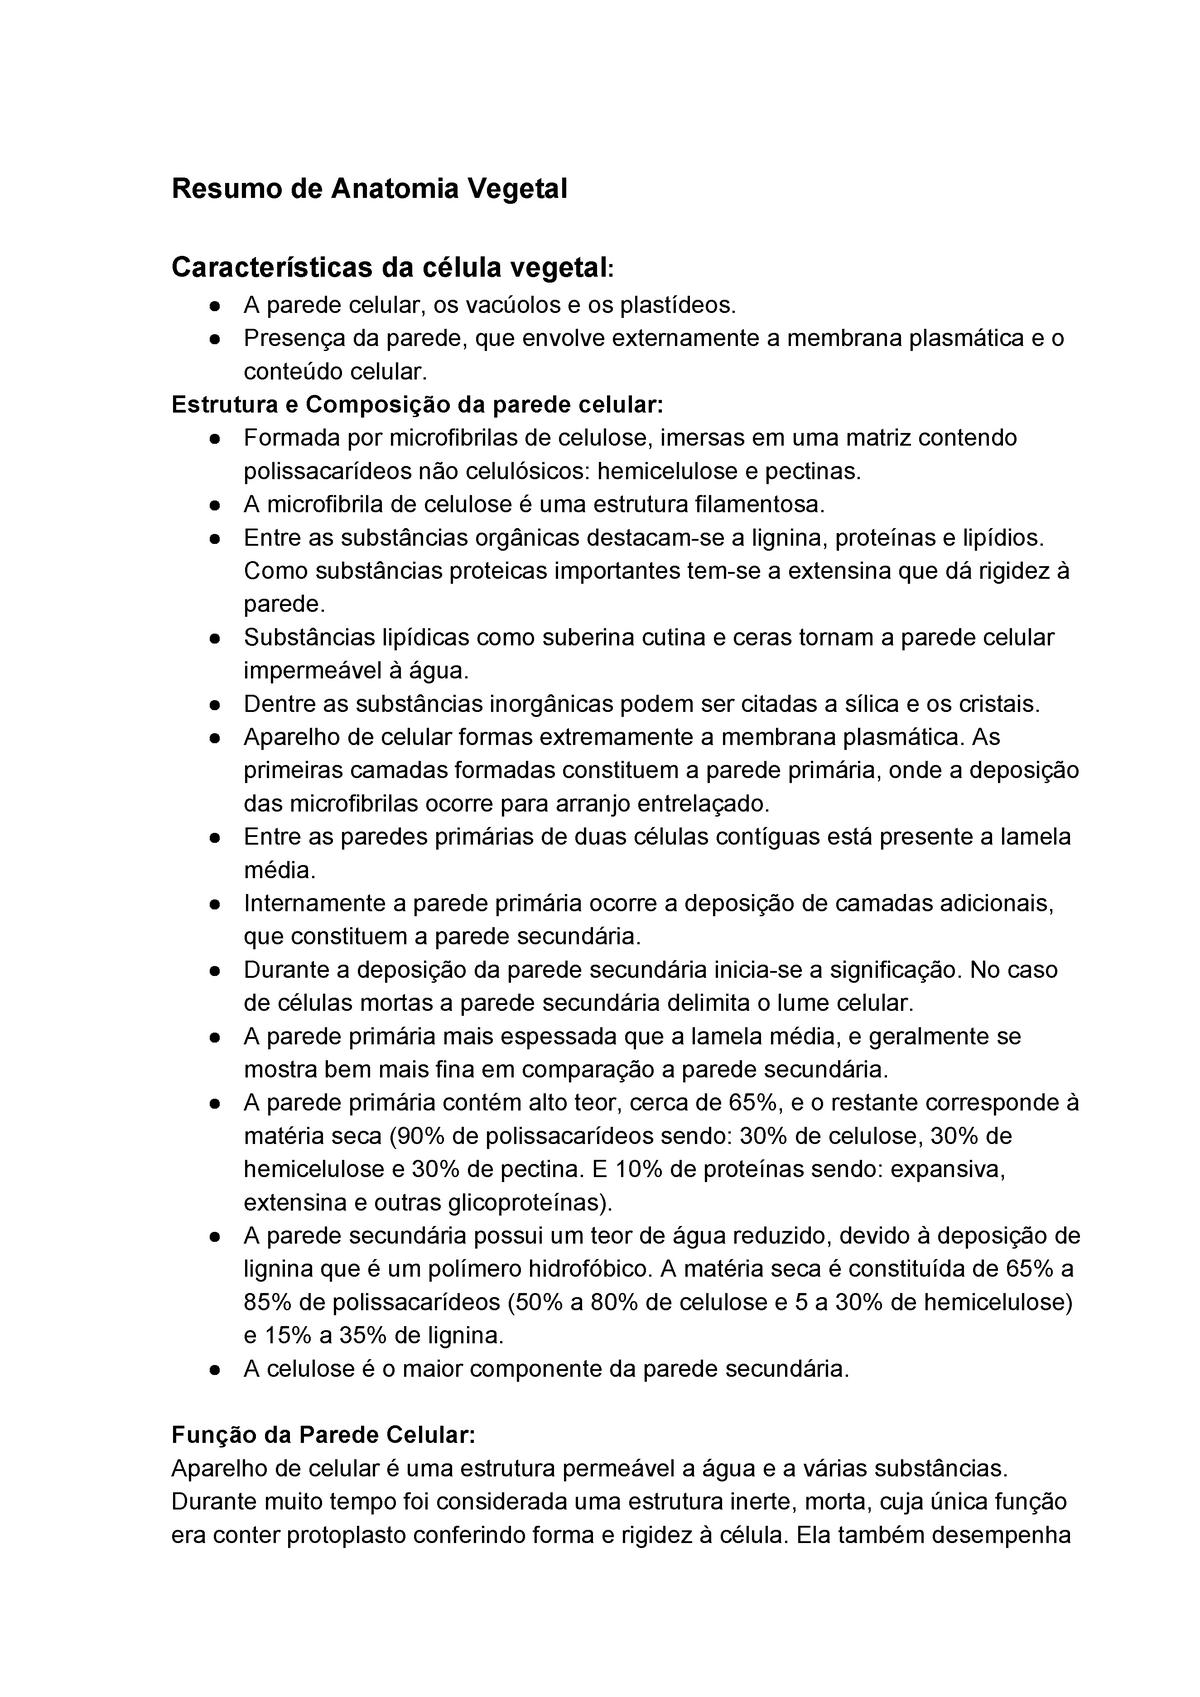 Anatomia Vegetal 1prova Icb0033 Ufg Studocu